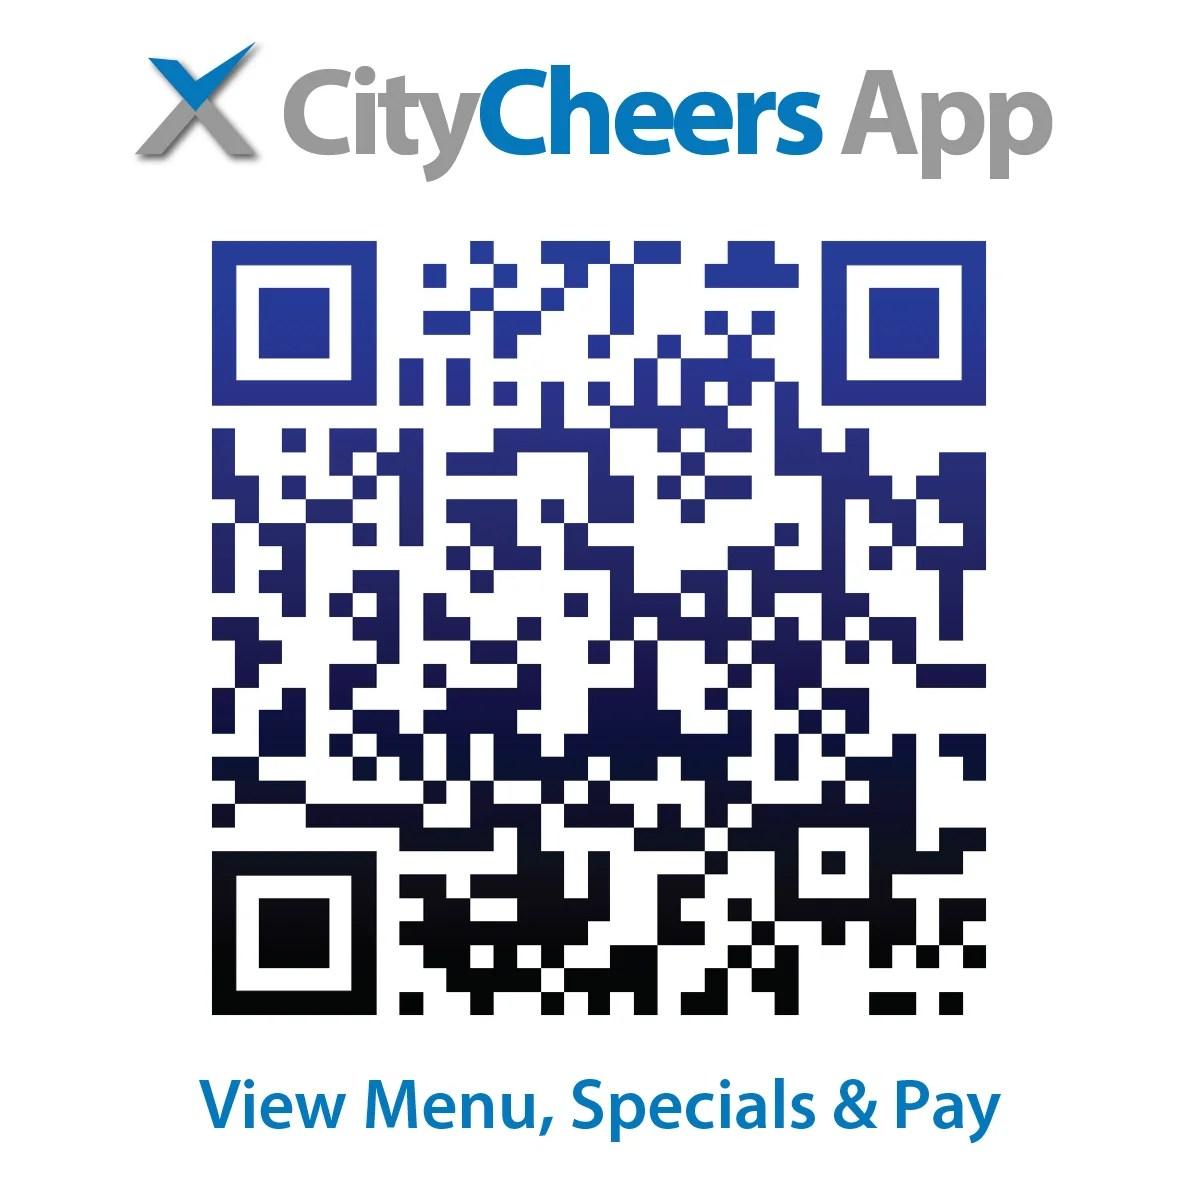 ServerCard 4x4-01